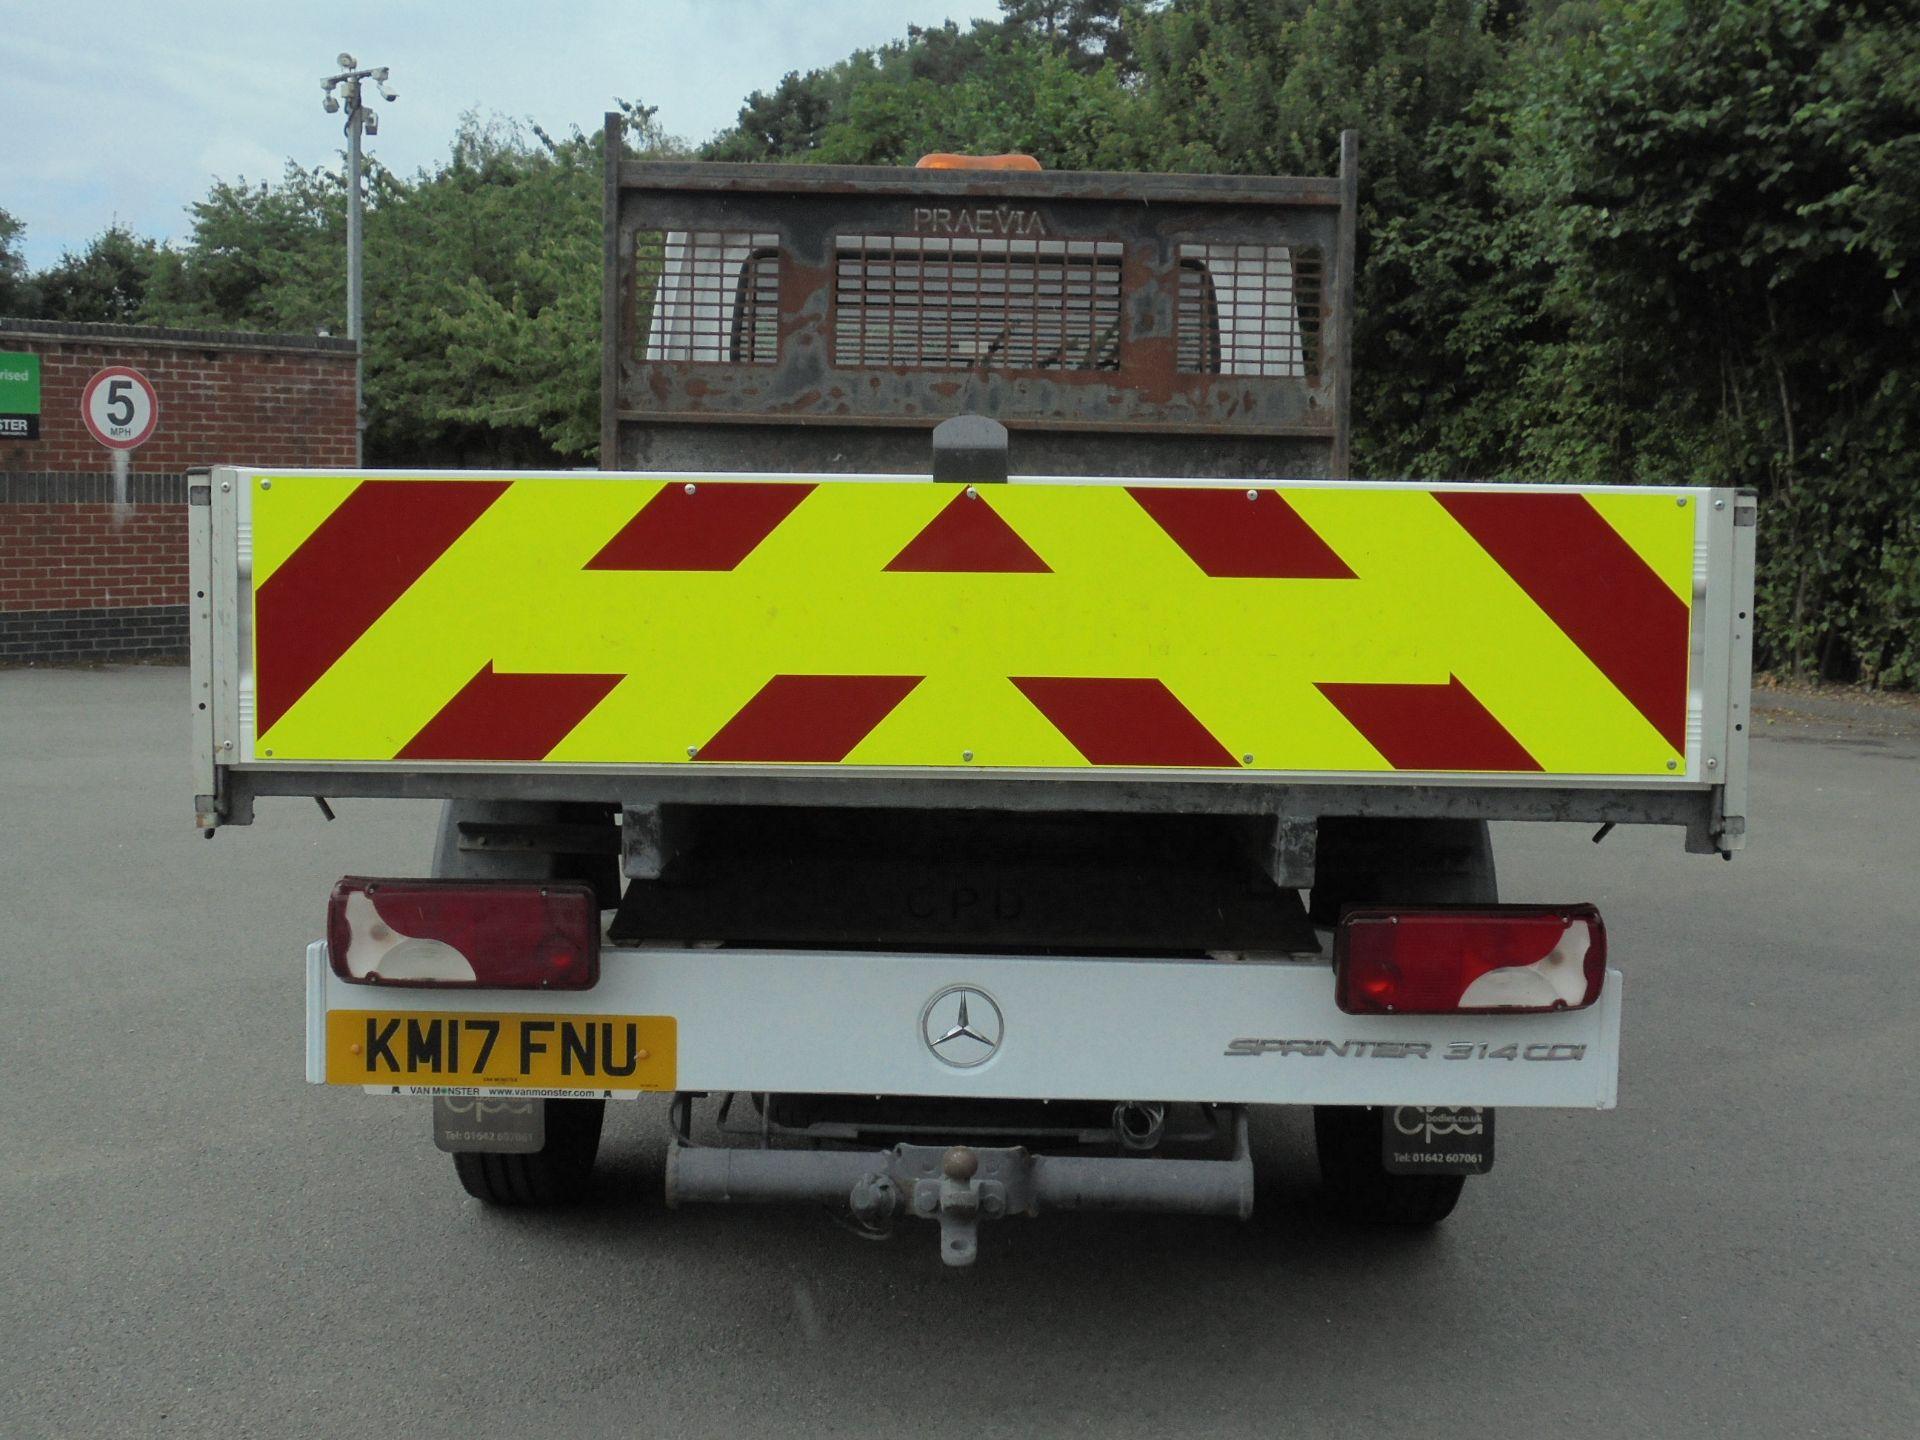 2017 Mercedes-Benz Sprinter 3.5T Crew Cab TIPPER (KM17FNU) Image 8